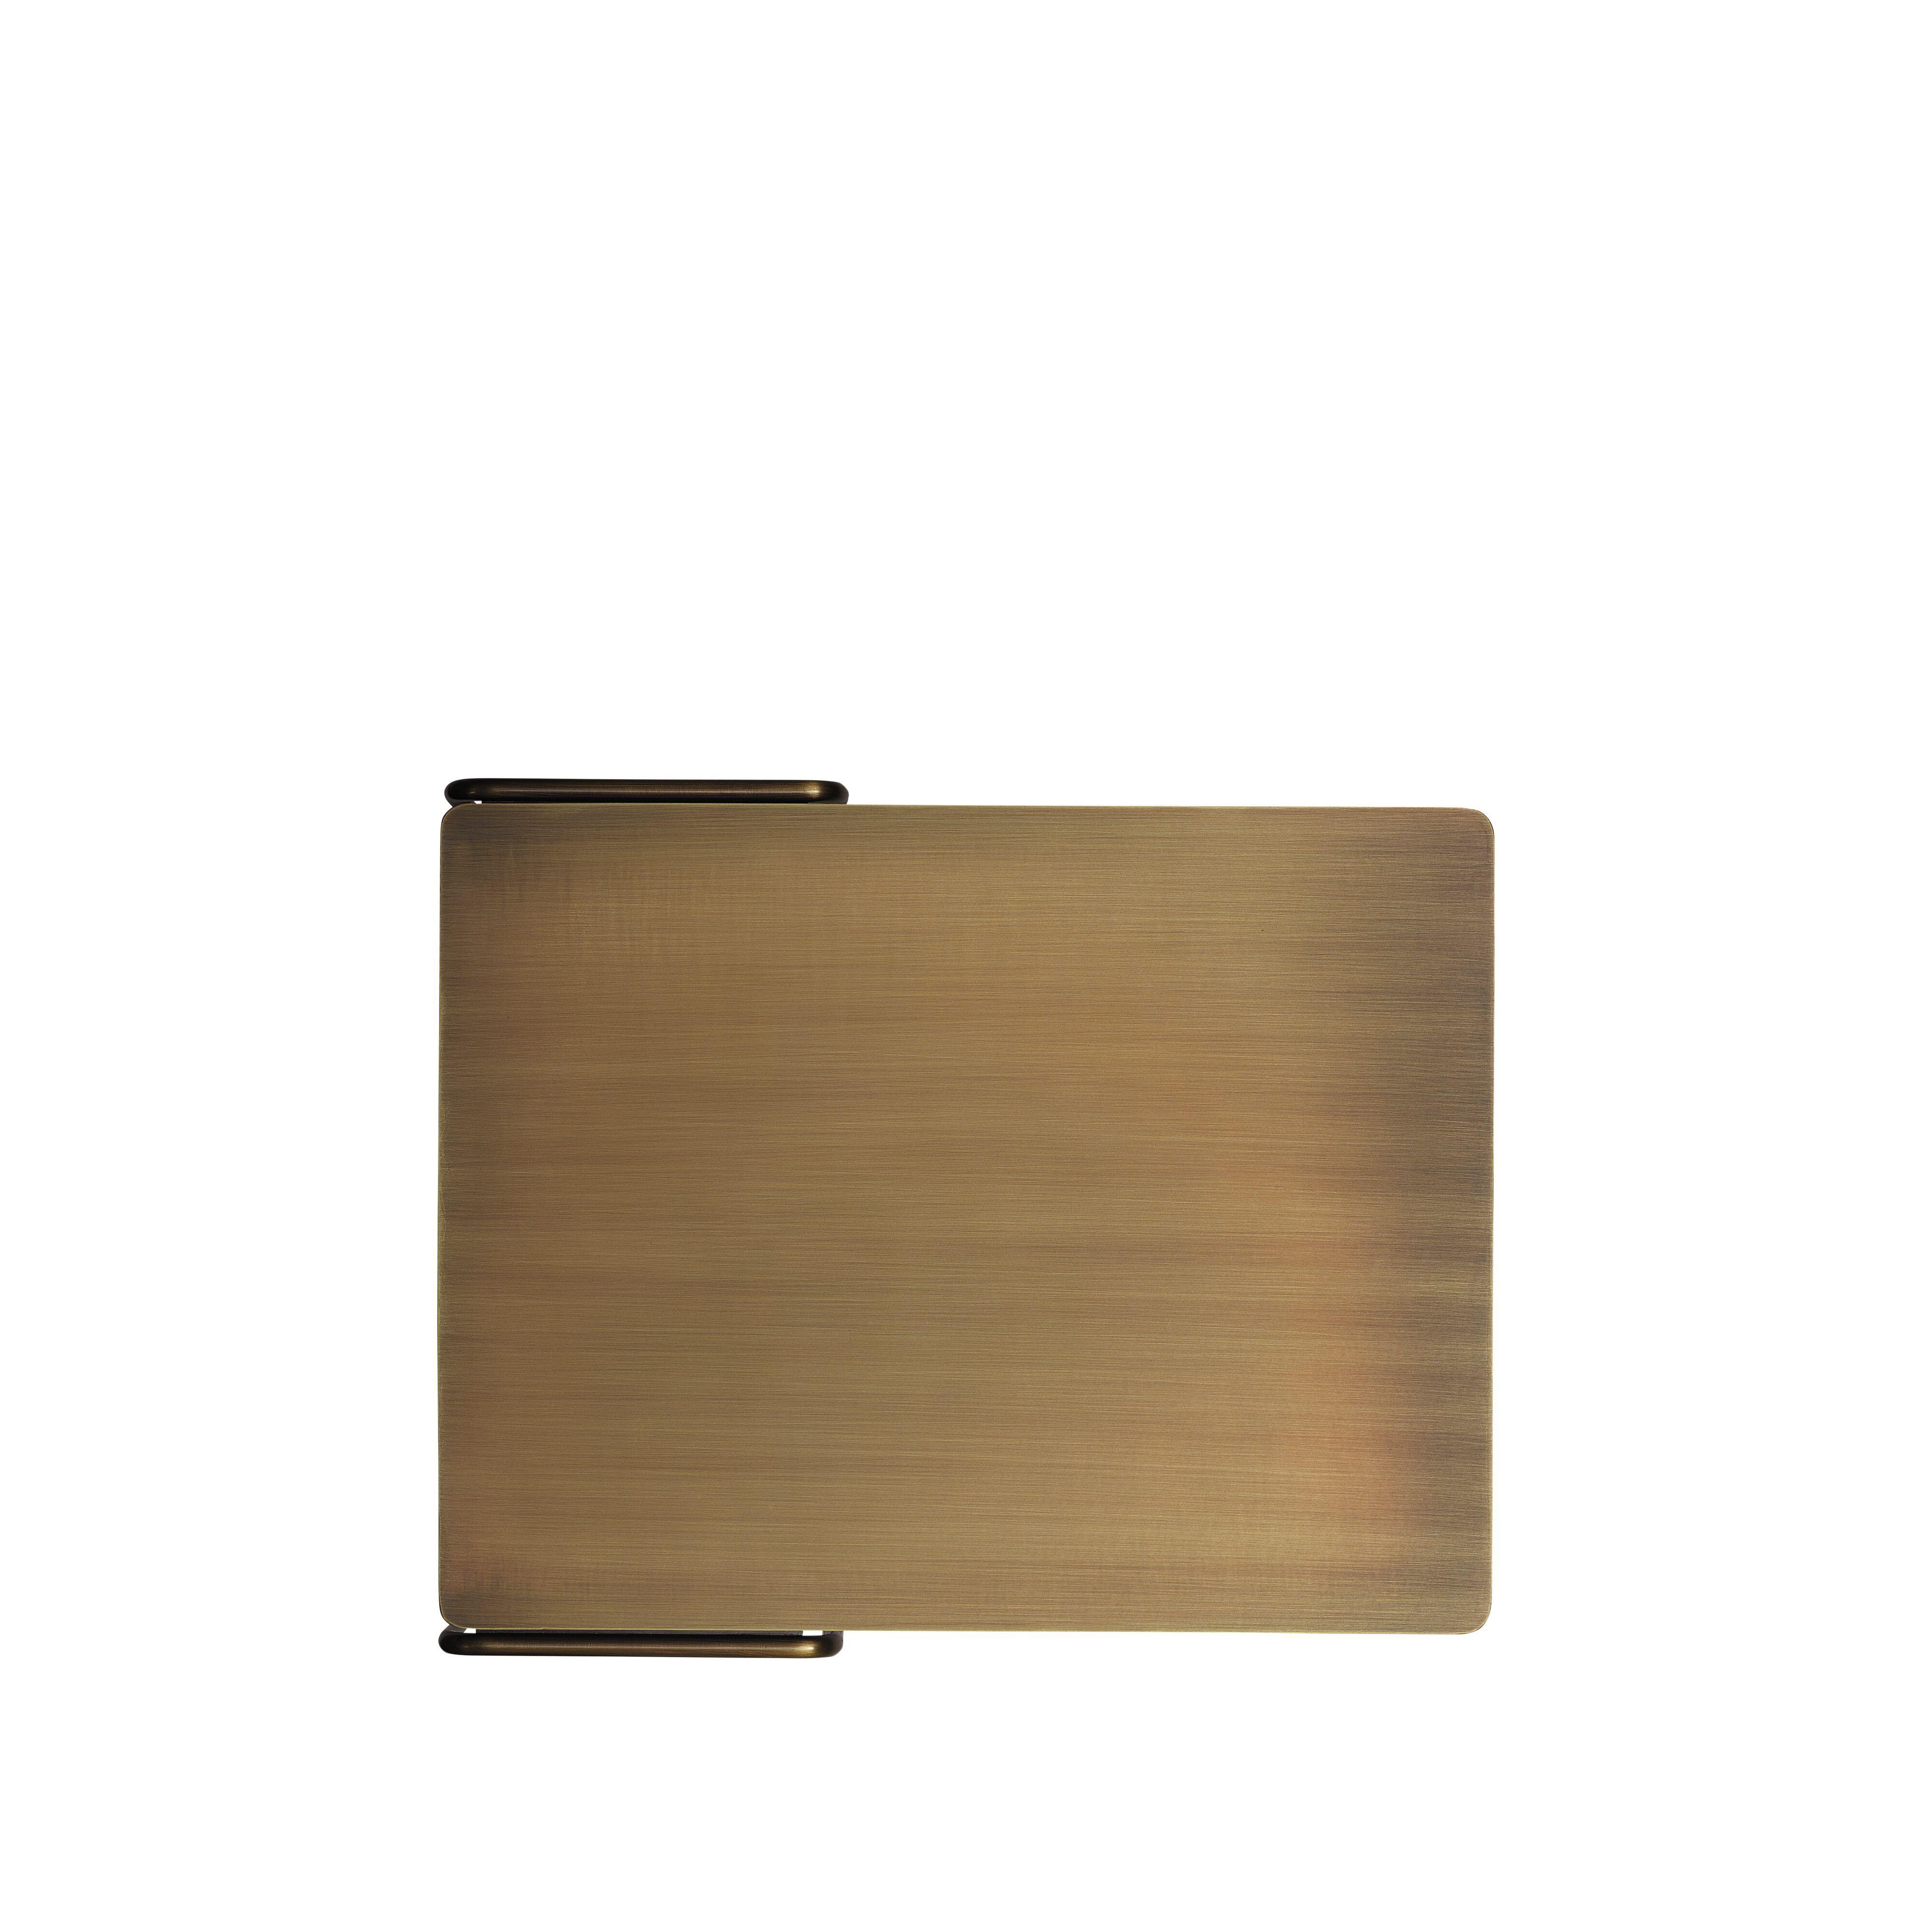 04-WK-Oki-0024_brass-H.tif